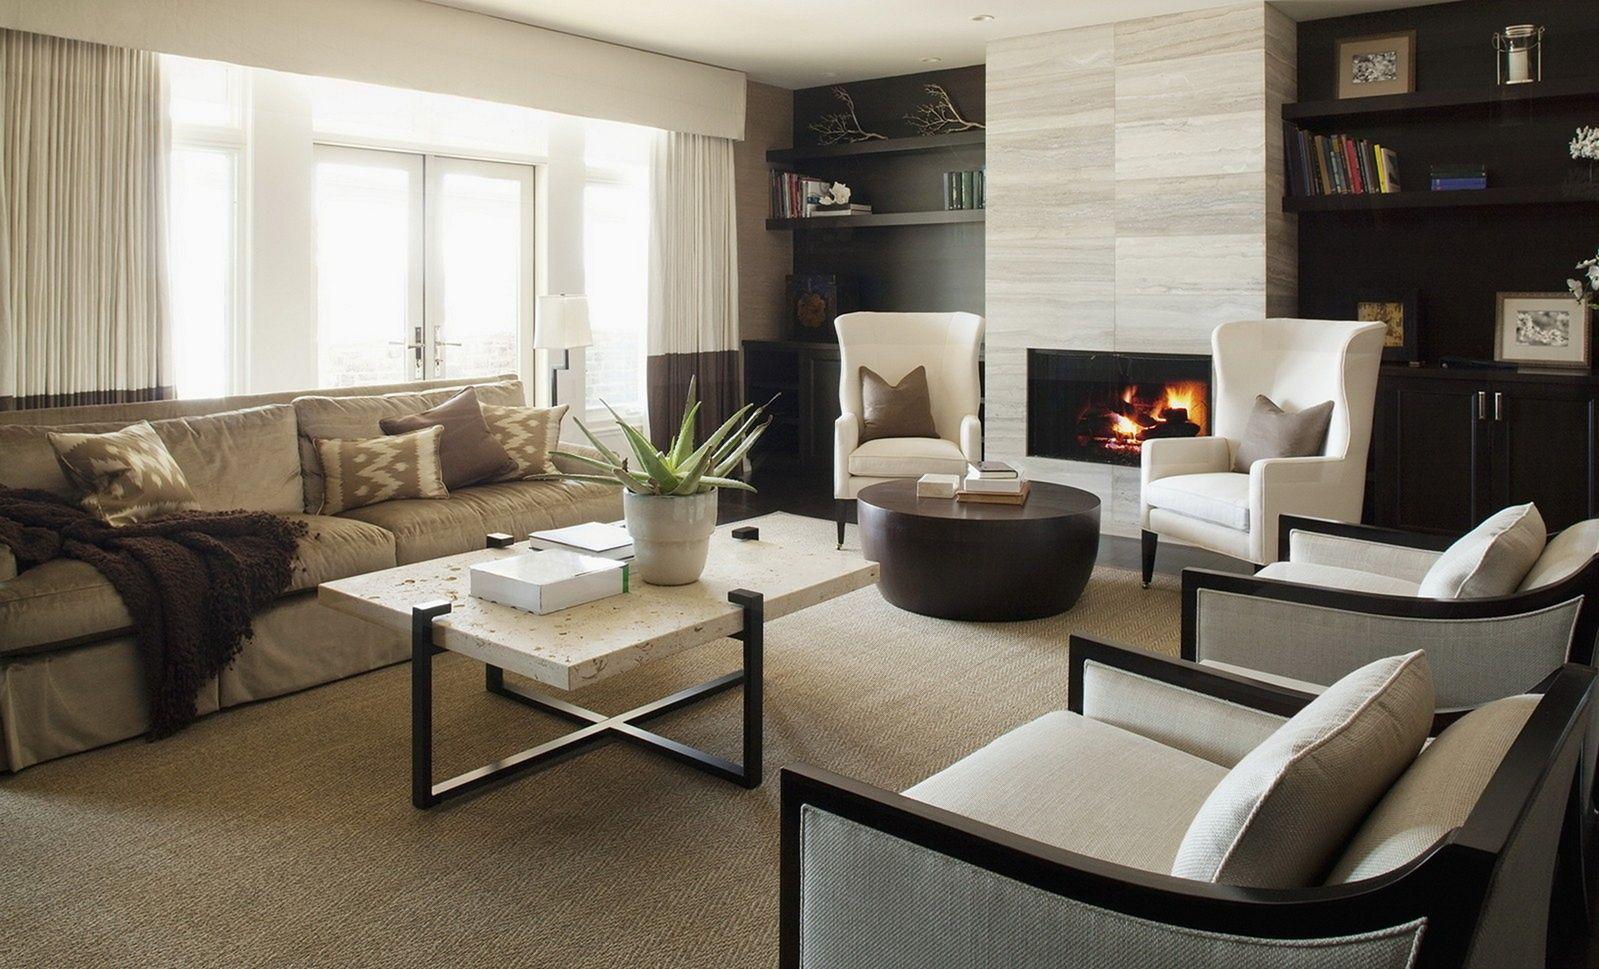 Jengky Living Room Table Design